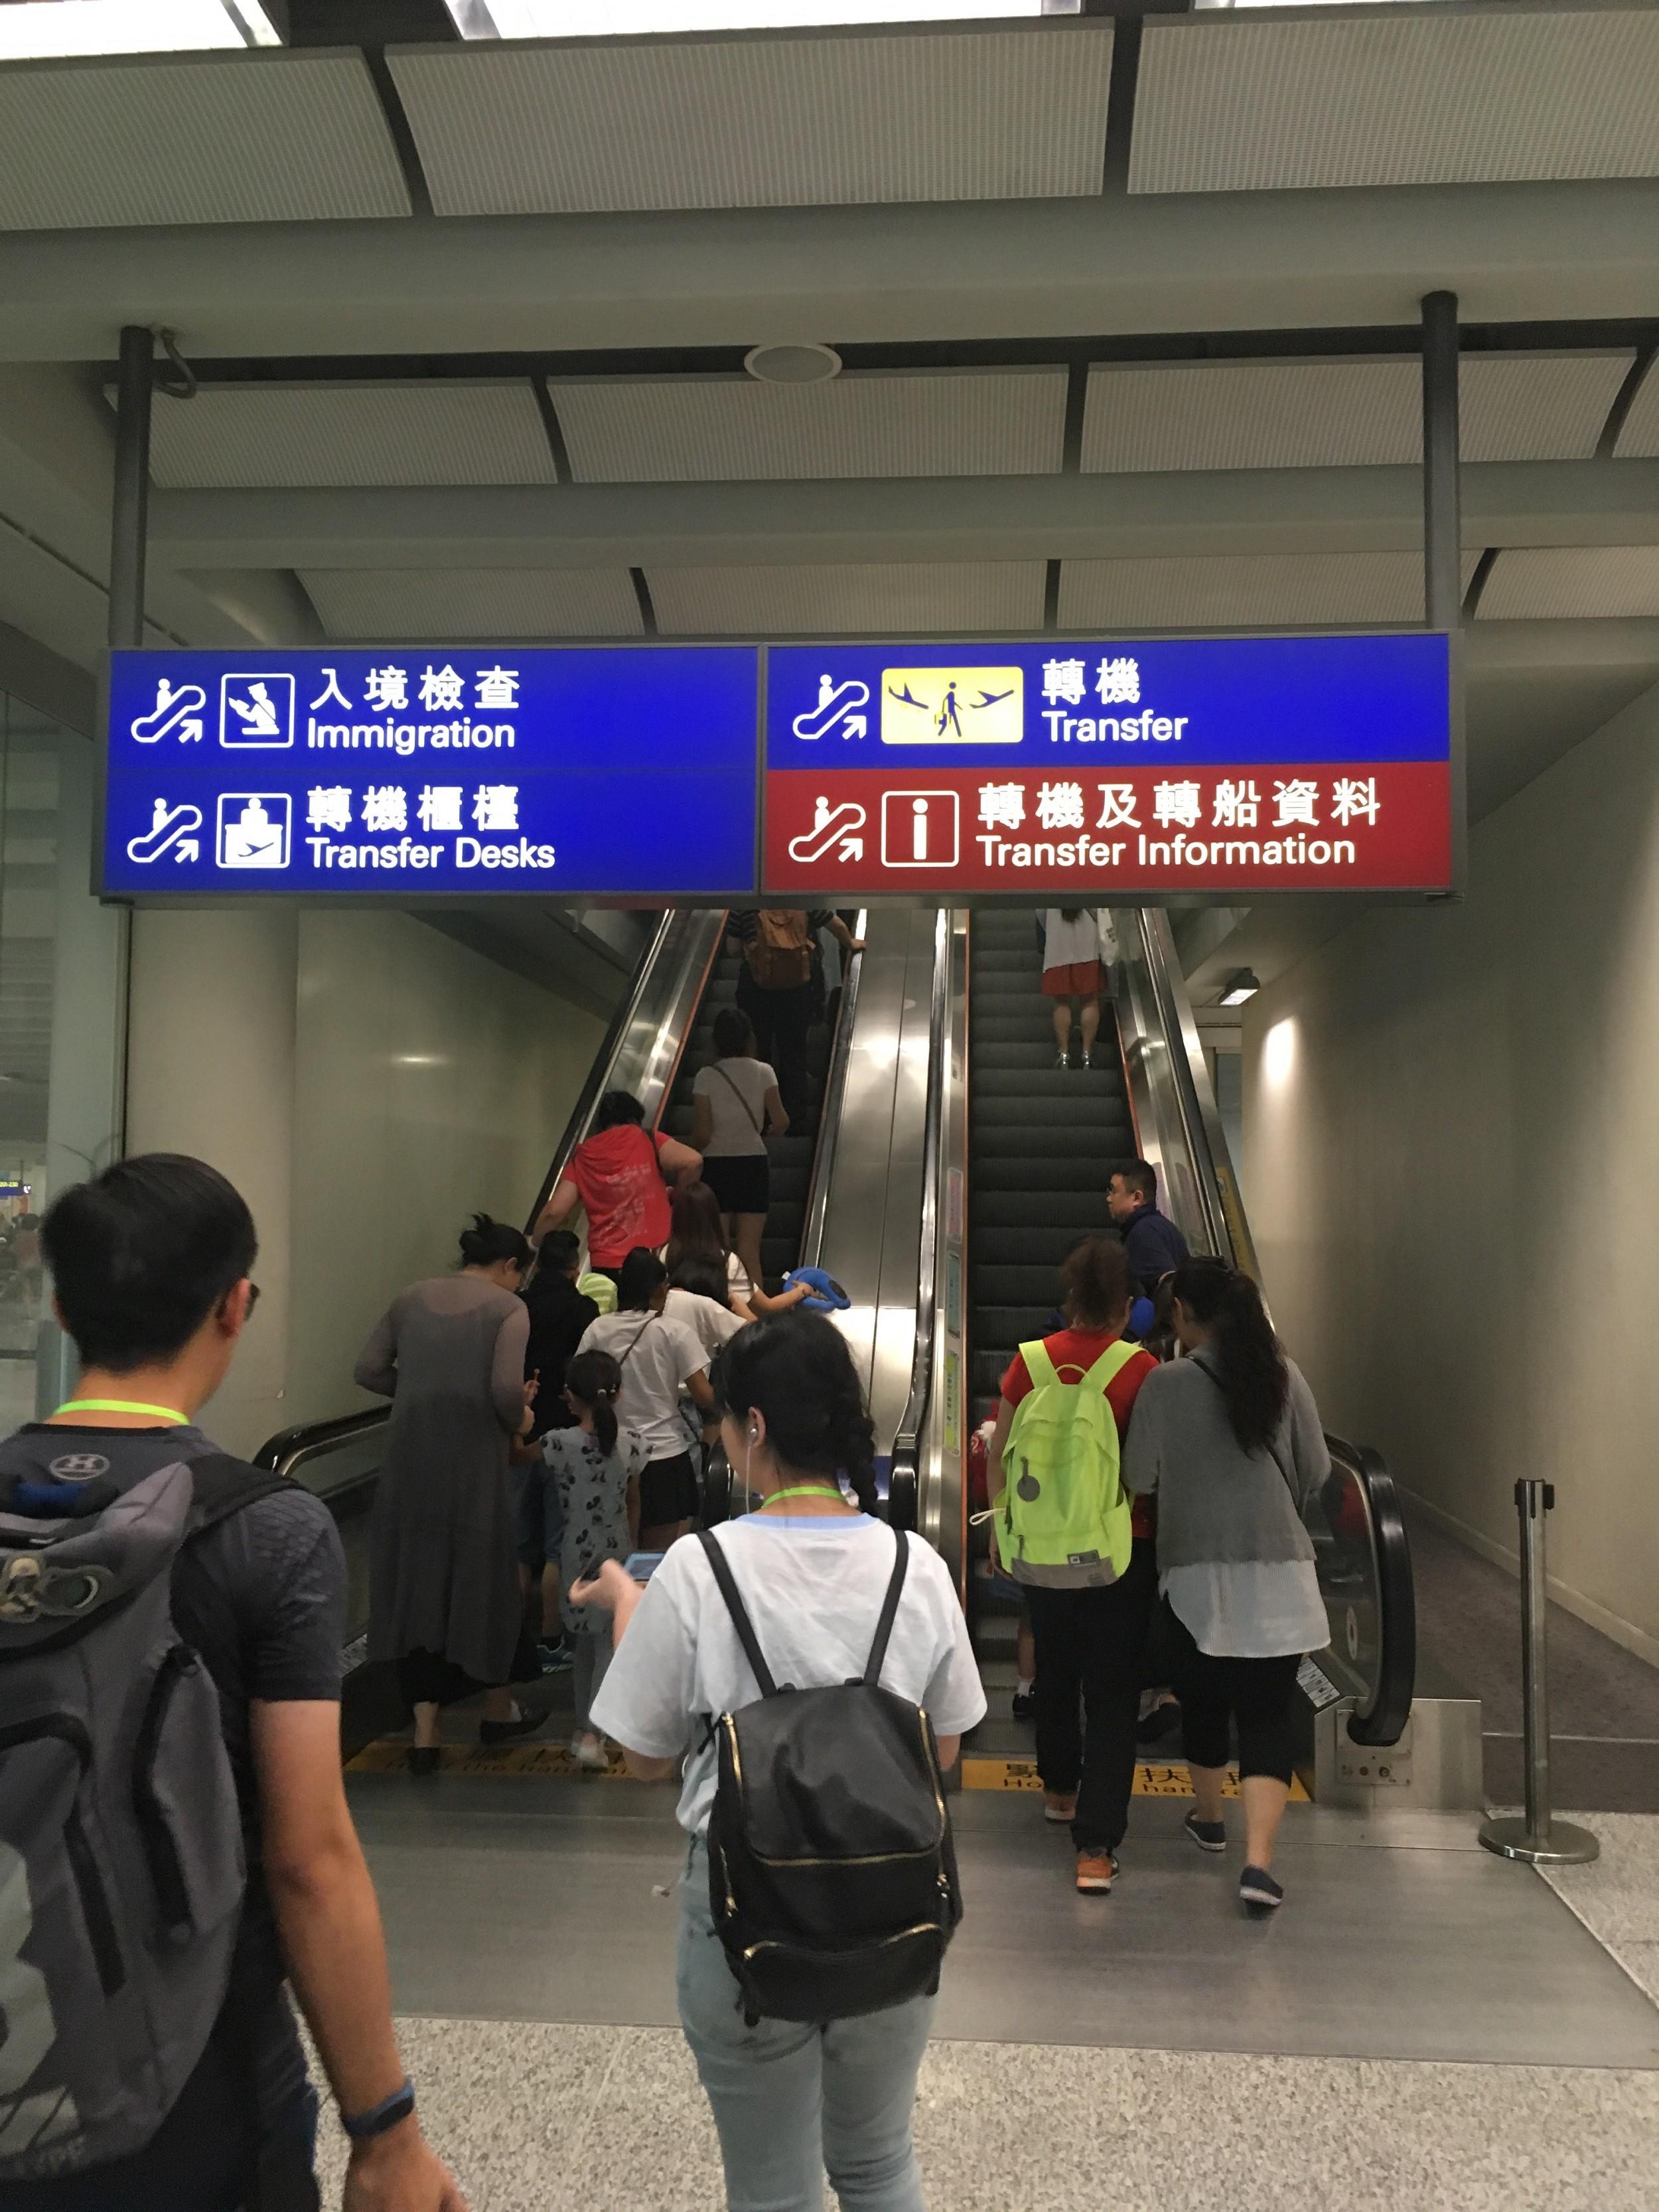 Re:[原创]~骚年飞行篇~补充半年前的CA111:PEK-HKG,有幸坐到大擦第50架A330! AIRBUS A330-300 B-5977 中国香港国际机场 中国香港国际机场